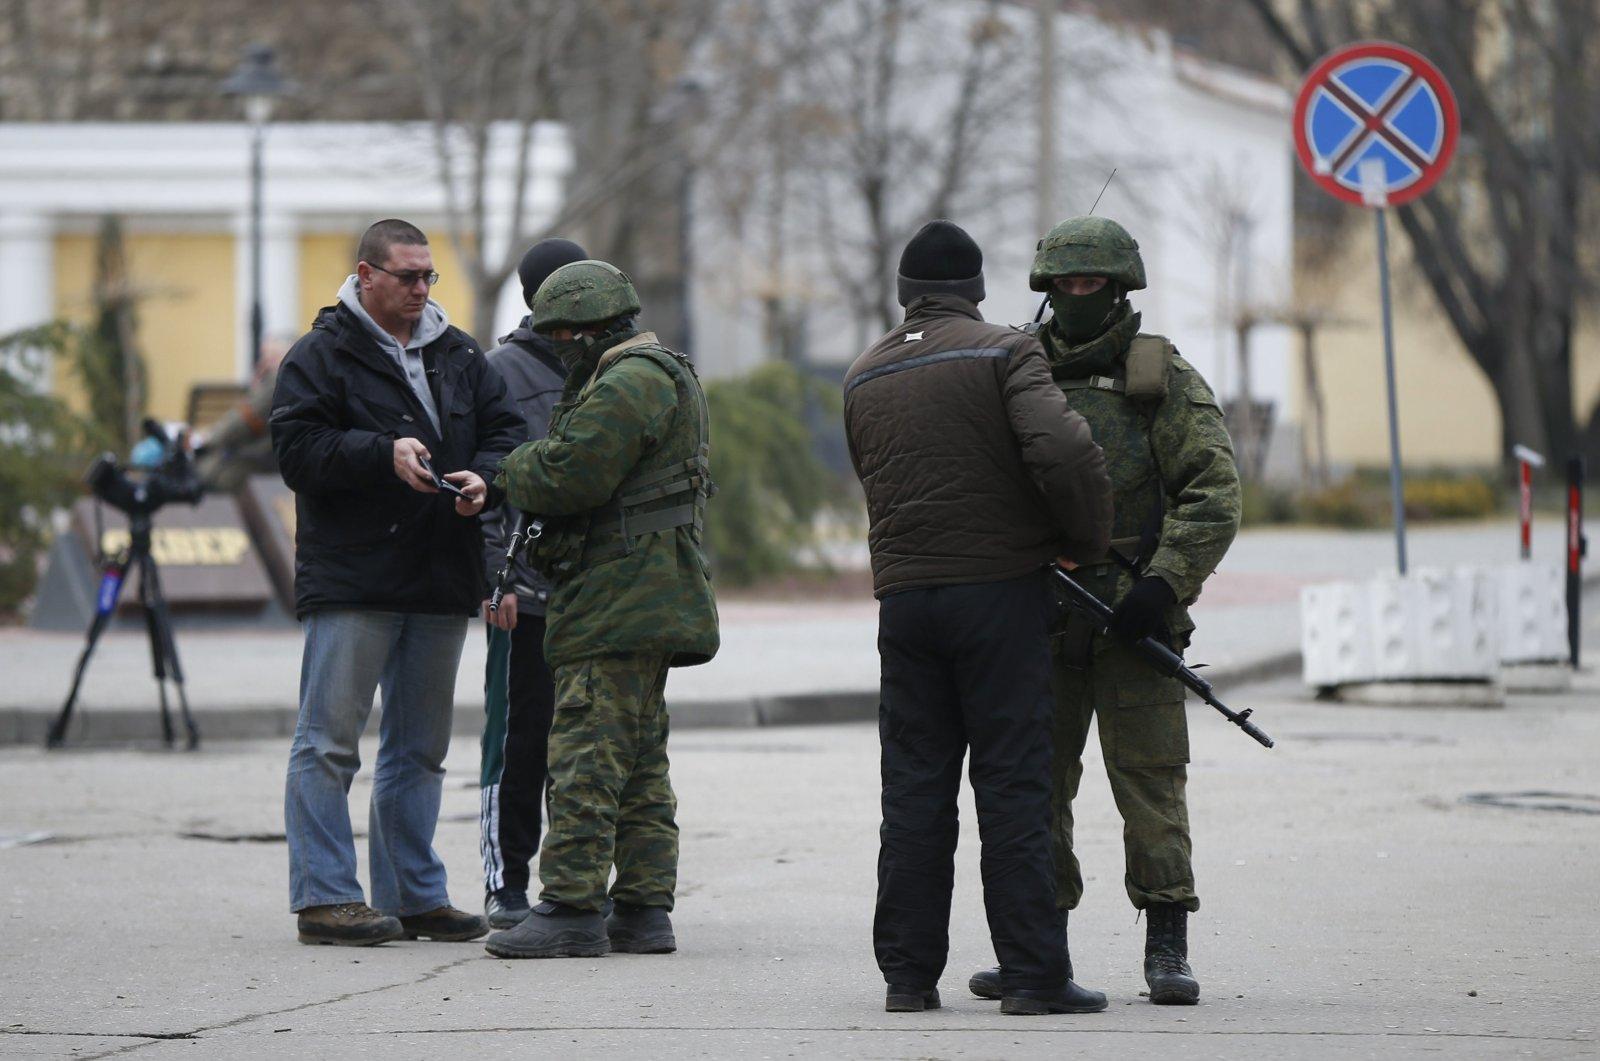 Armed men check journalists' documents around the regional parliament building in Simferopol, Crimea, occupied Ukraine, March 1, 2014. (Reuters Photo)